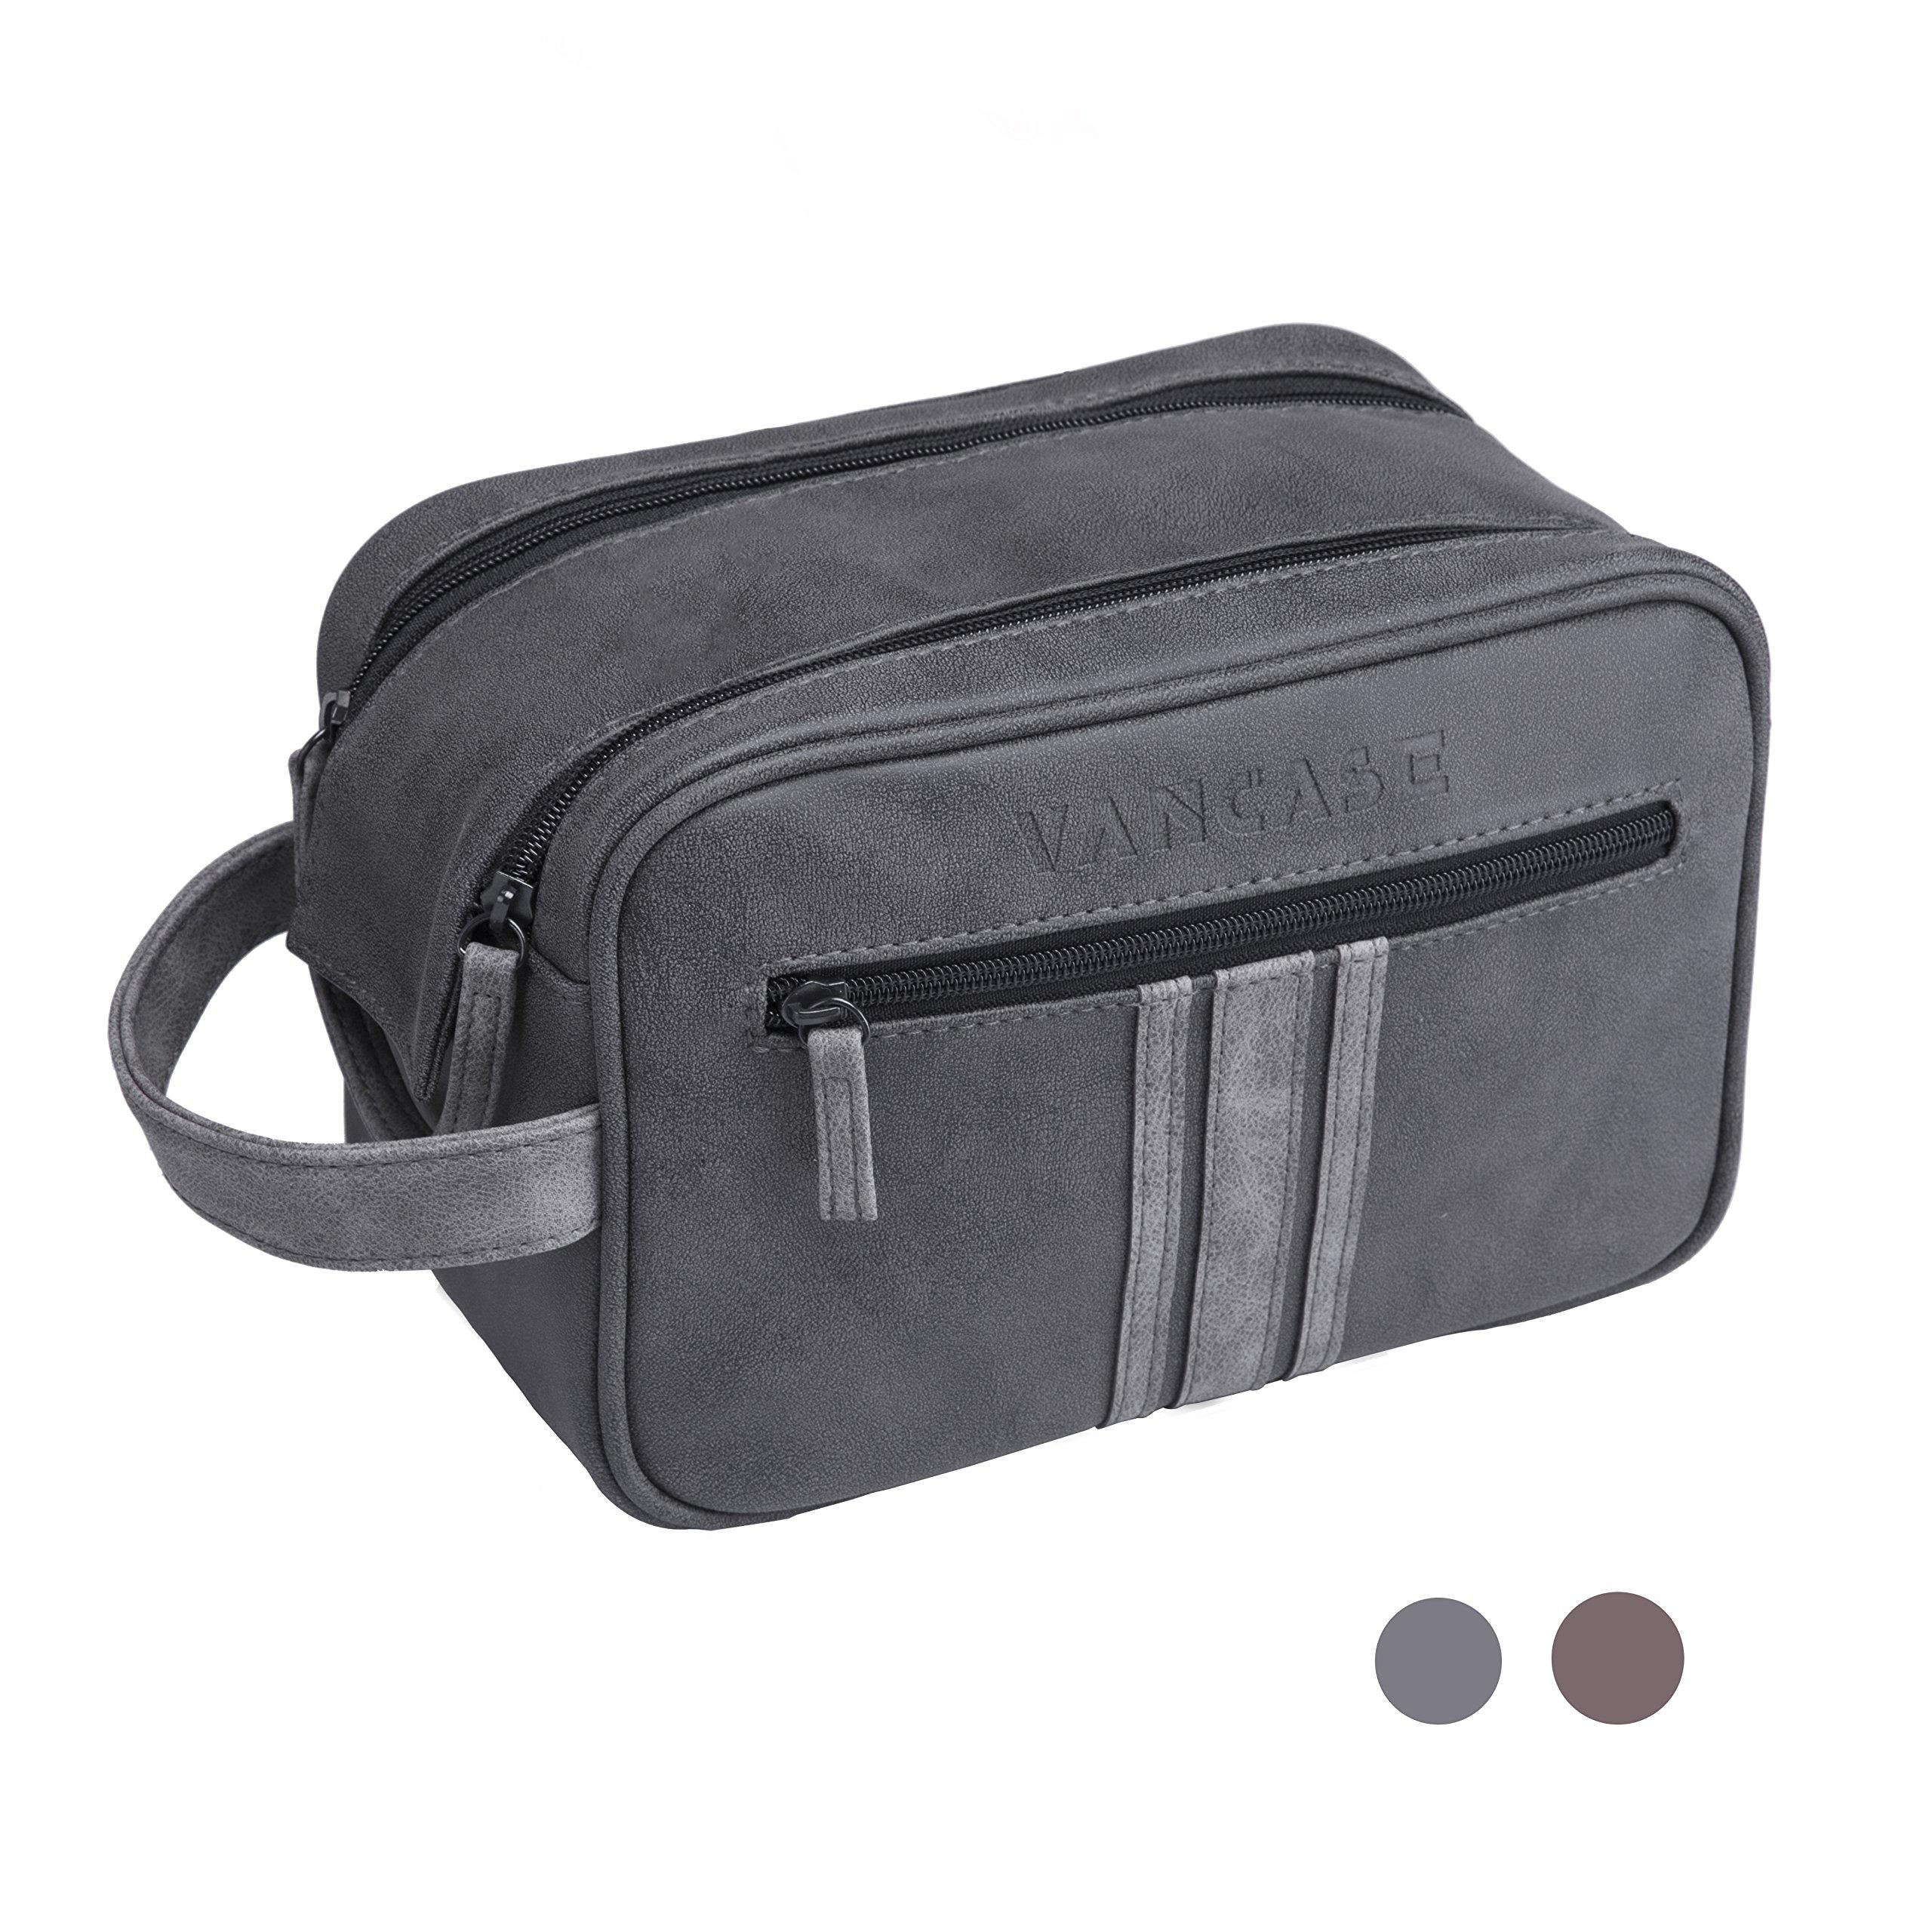 VANCASE Hanging Toiletry Bag for Men Leather Wahs Bag Shaving Kit//Bathroom Shower Dopp Bag//Travel Accessories Organizer//Great Gift